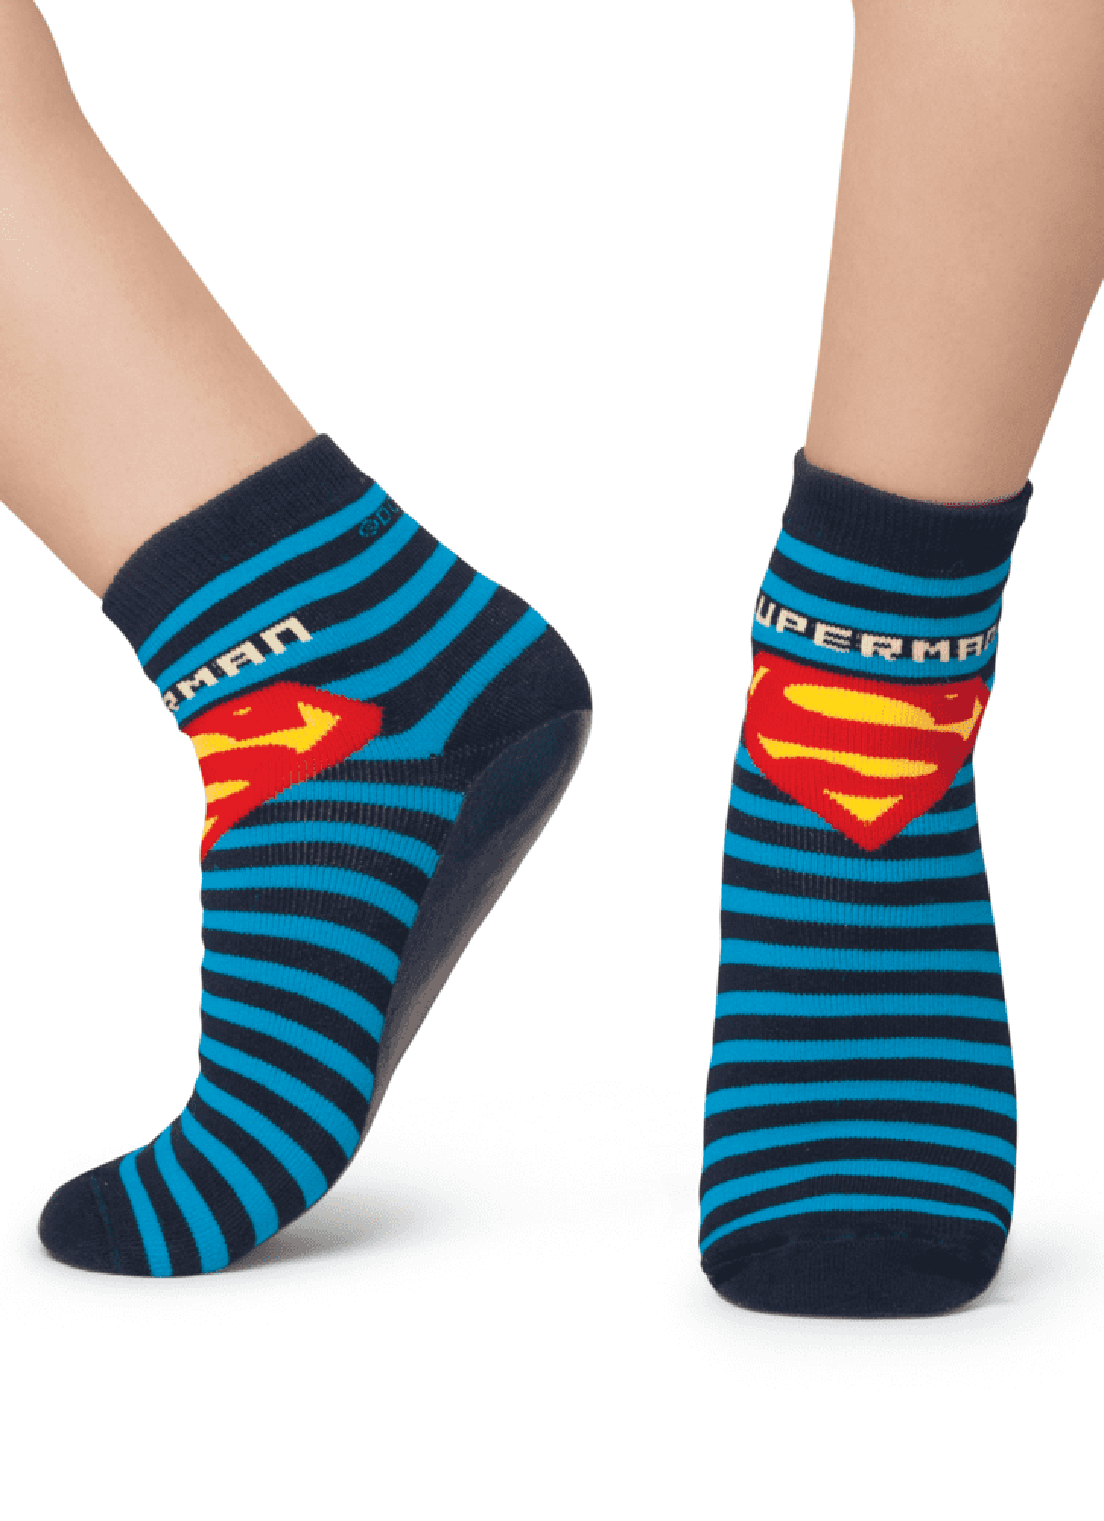 Meia Puket Soquete com sola emborrachada (Pansock) Superman Marinho